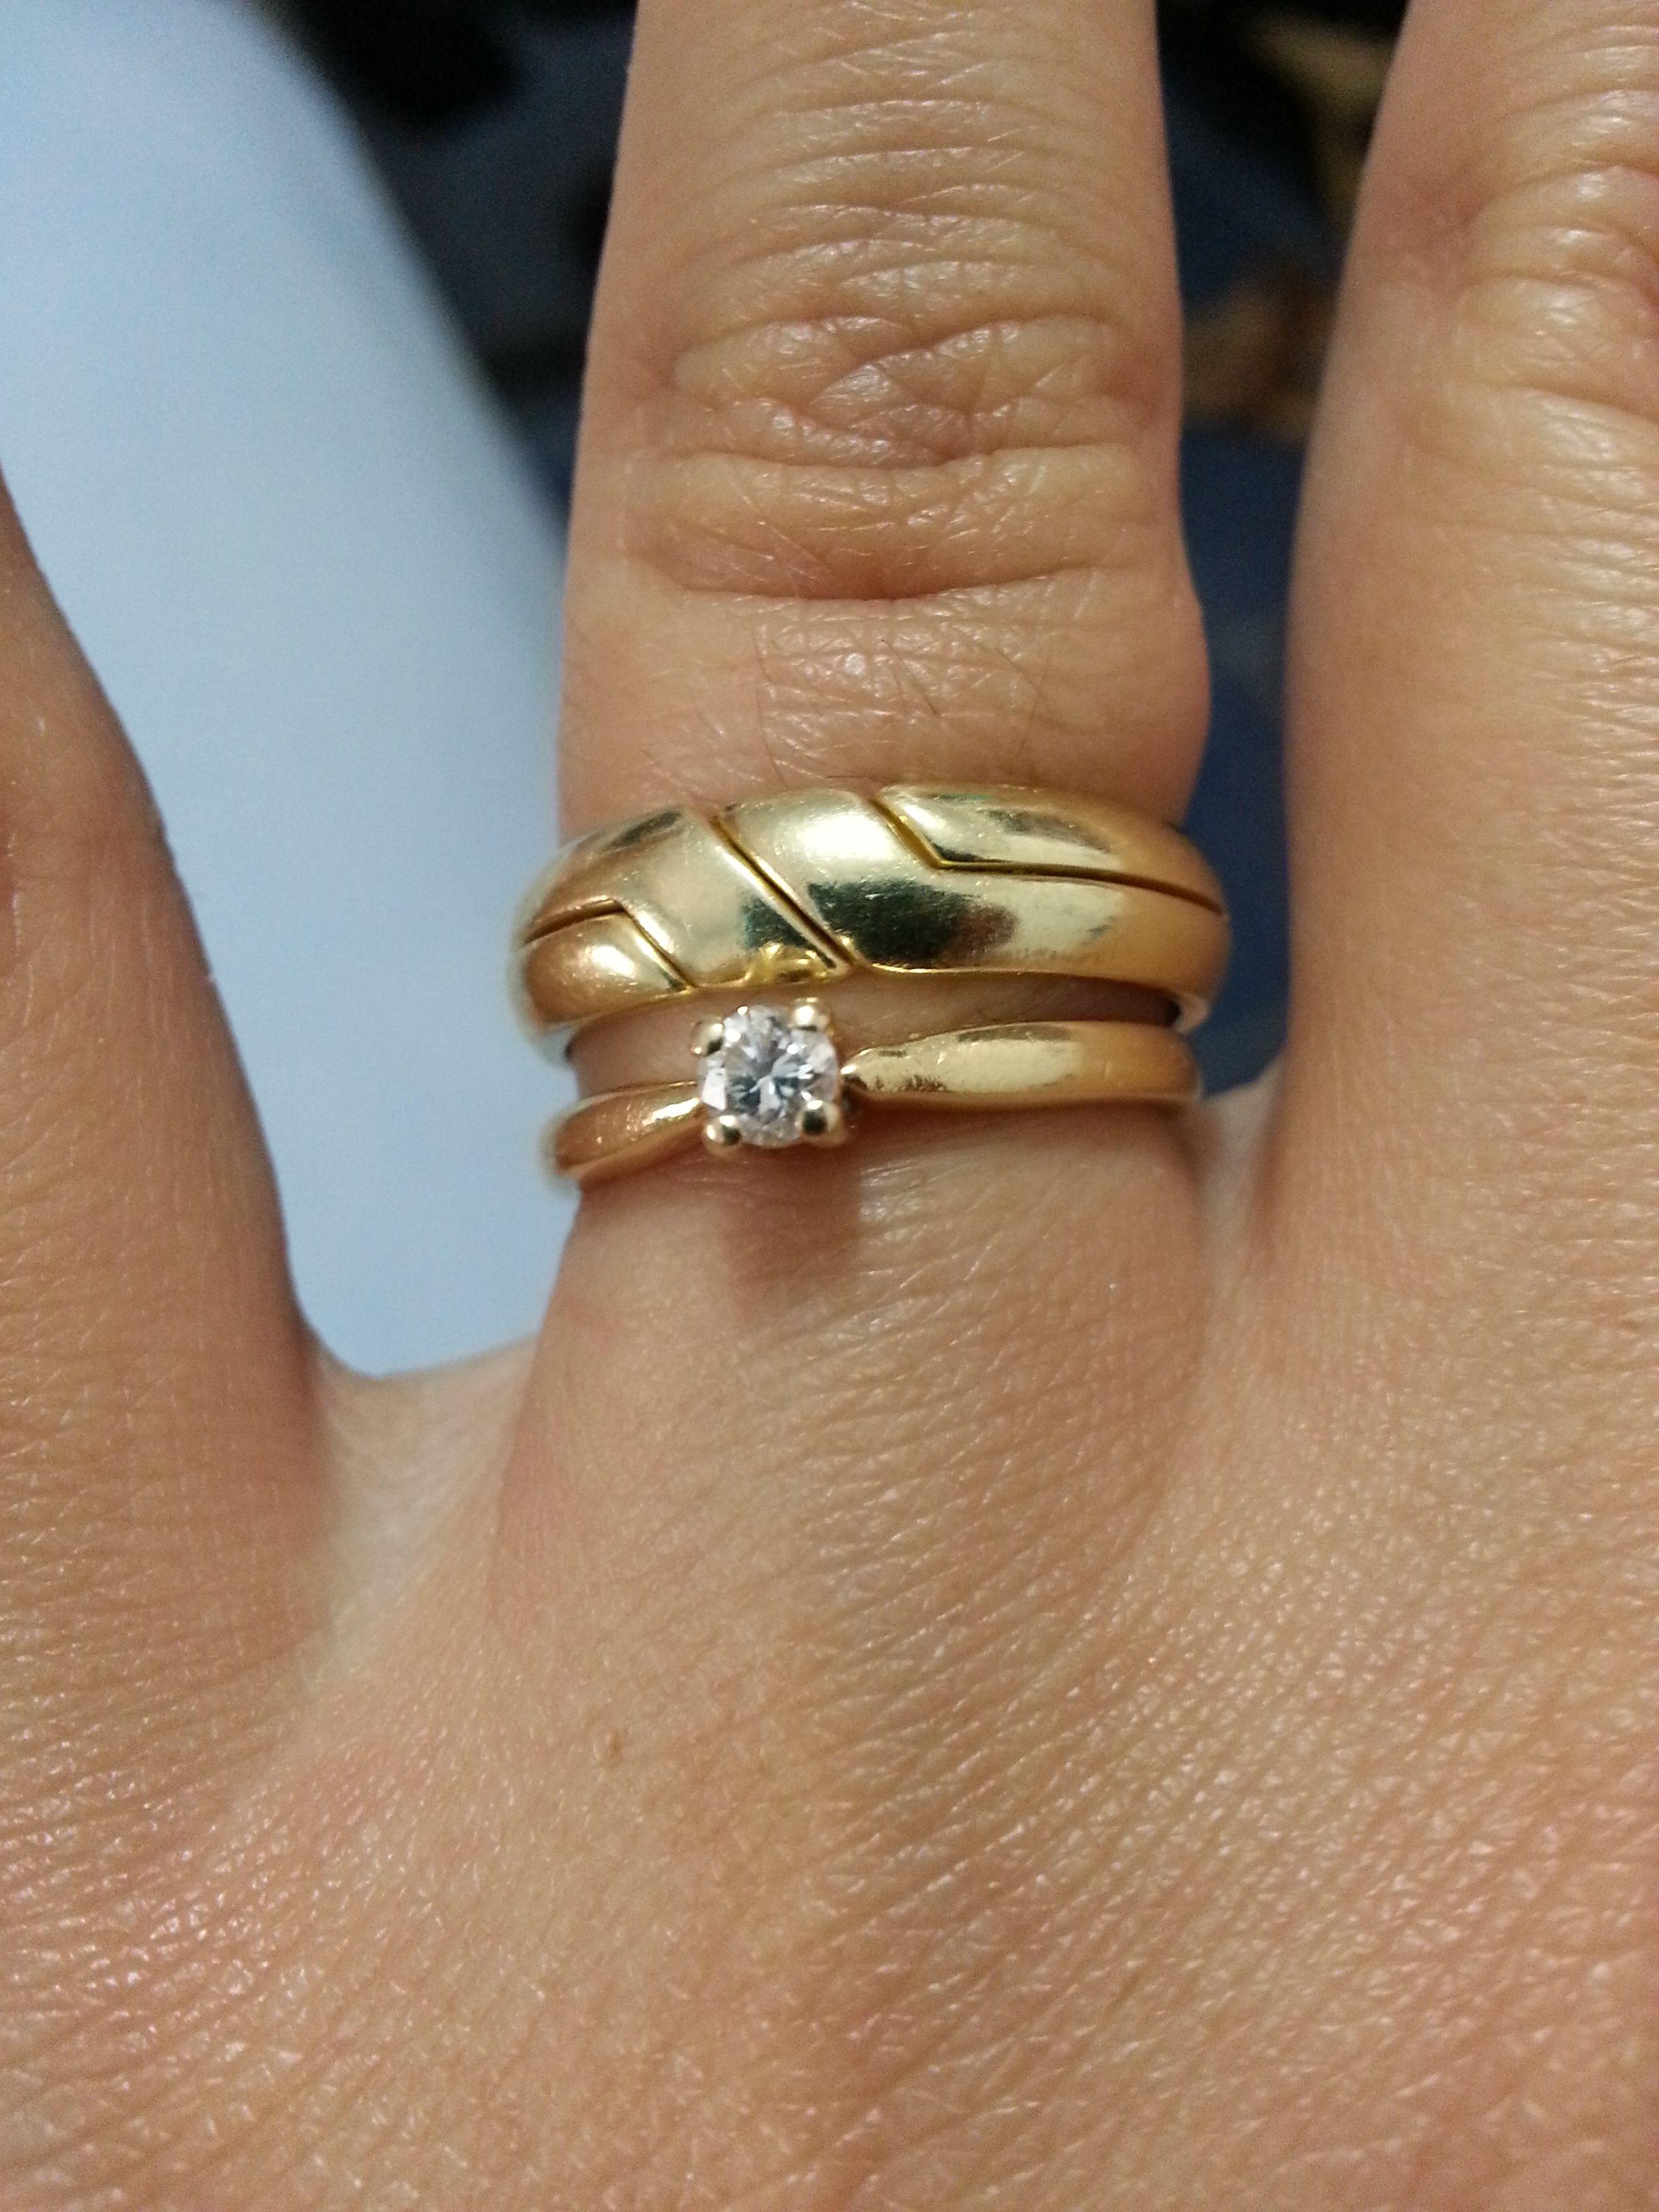 93d4ce390bd5 Anillos compromiso y boda oro amarillo 14 k